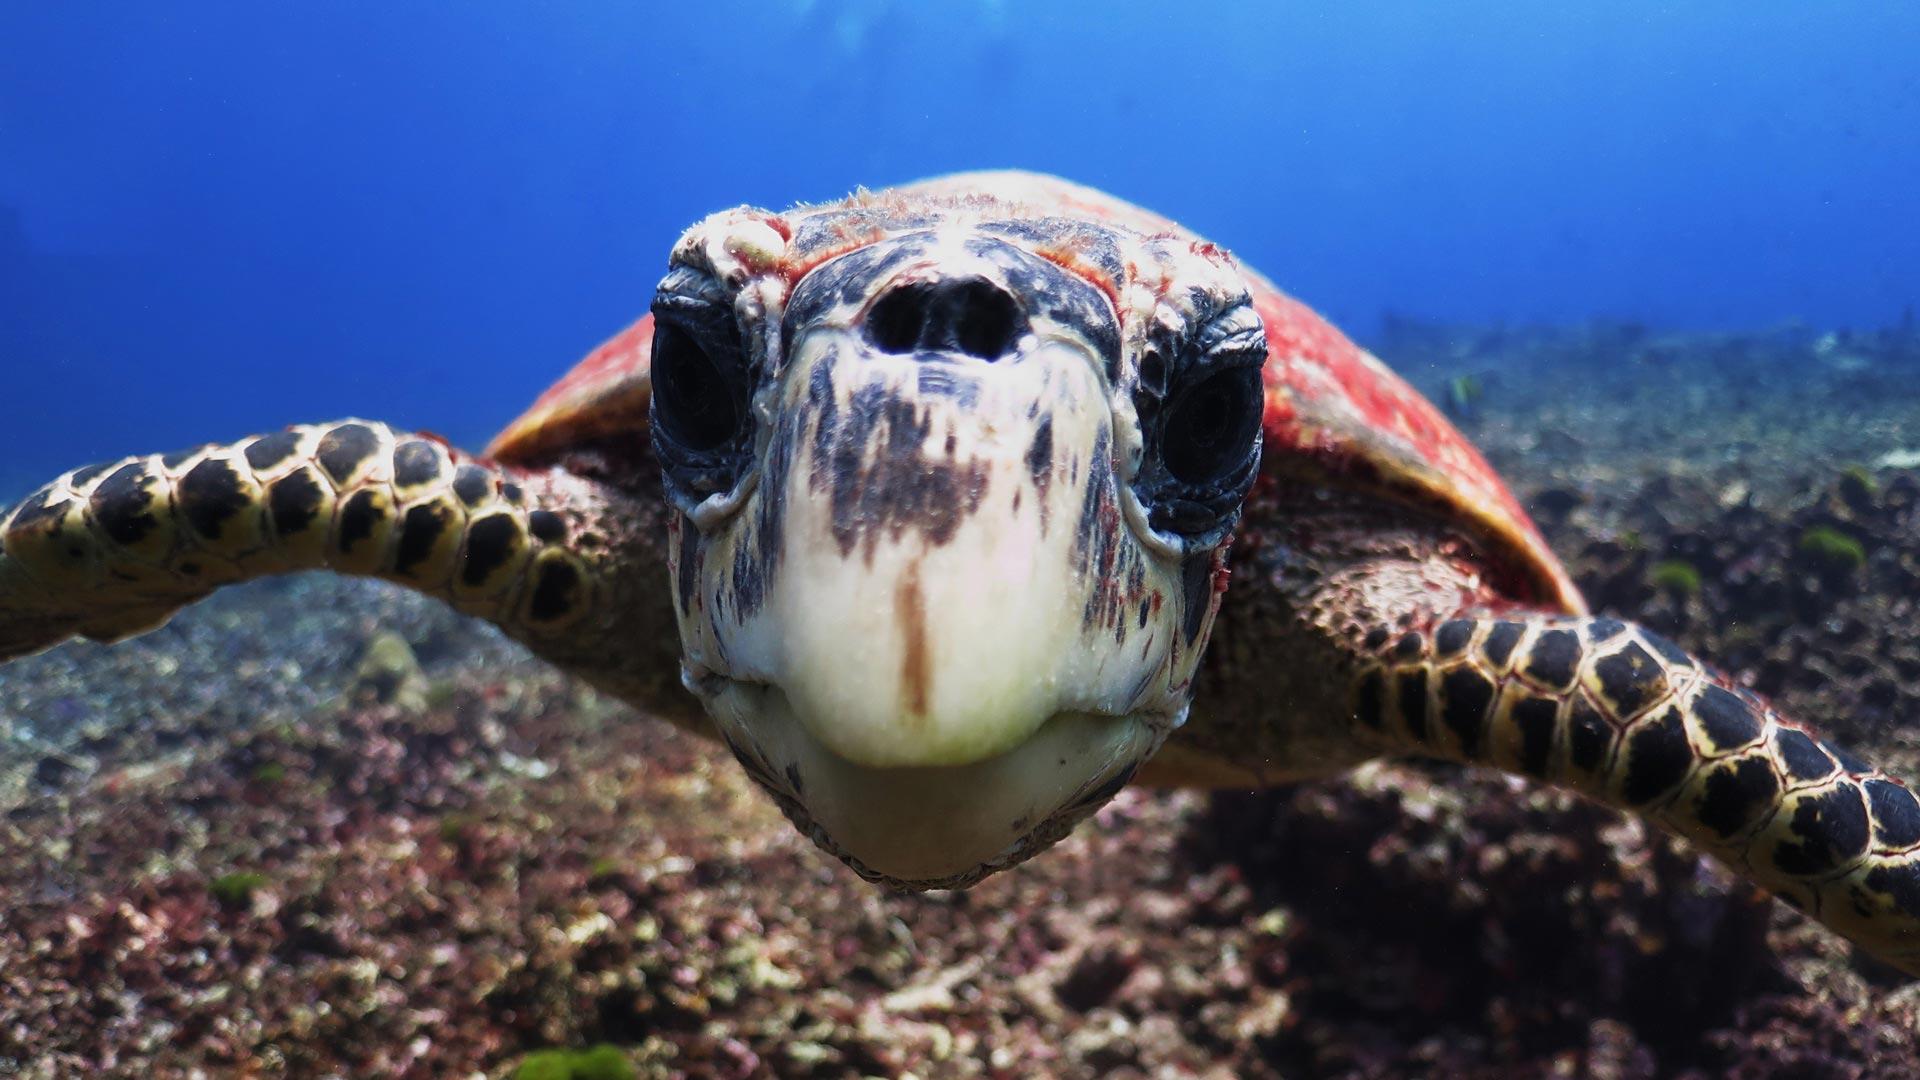 Manta Queen 5 is a 3 days Similan islands diving liveaboard